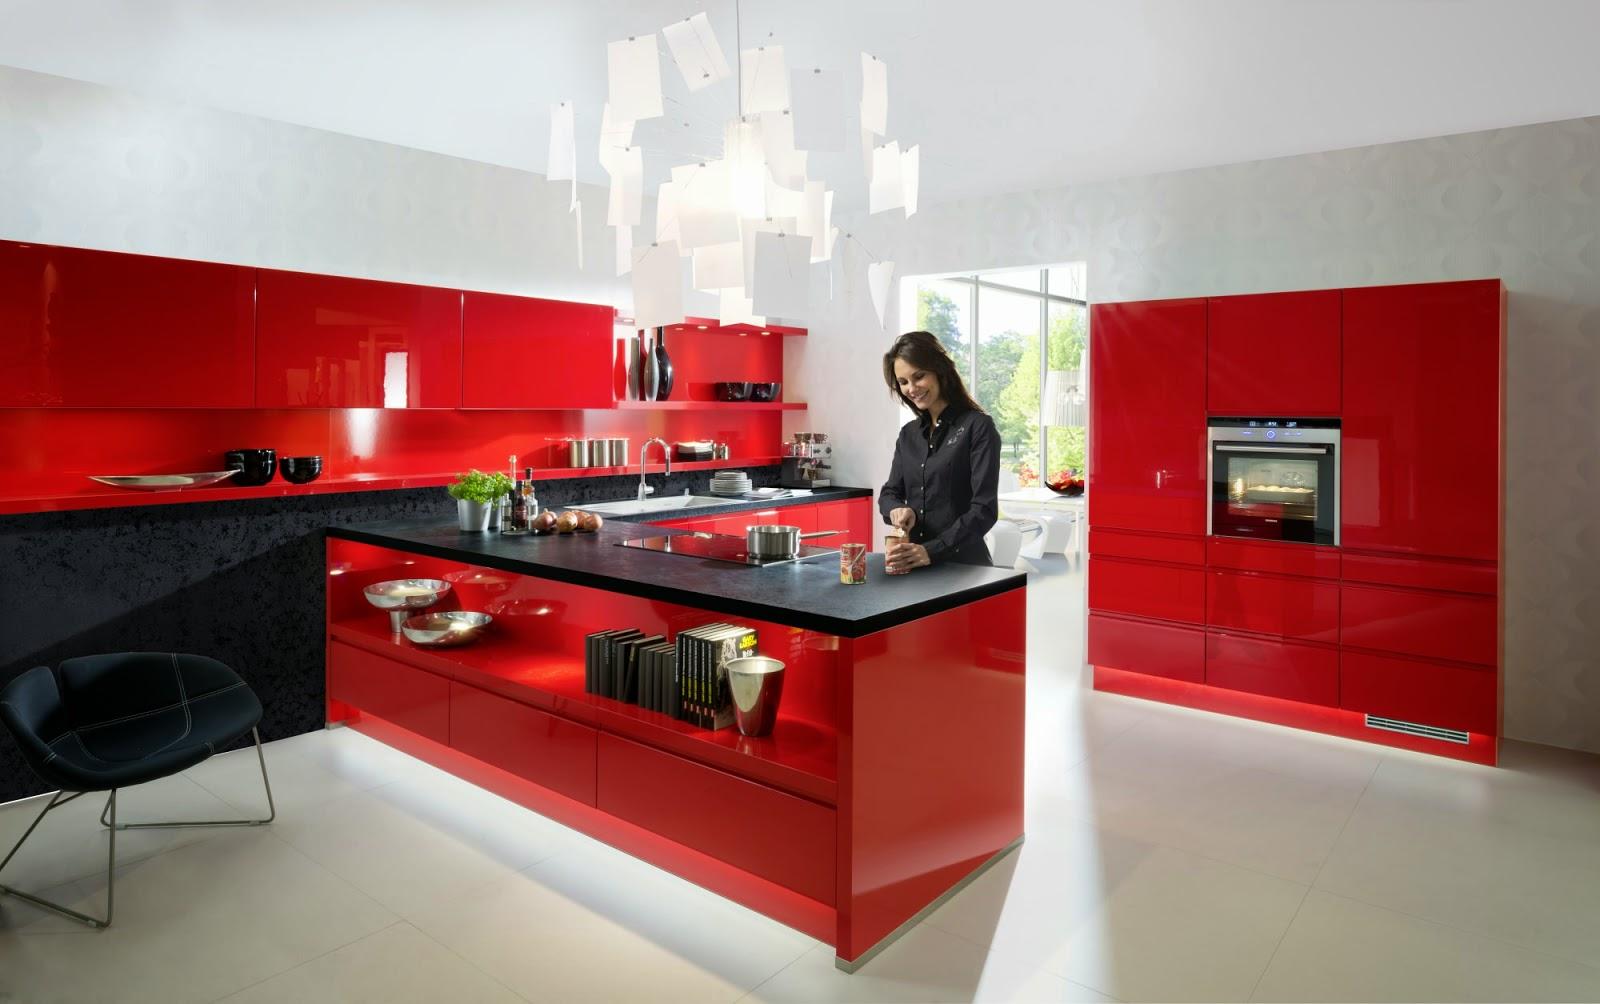 cuisines quip es nolte k chen. Black Bedroom Furniture Sets. Home Design Ideas